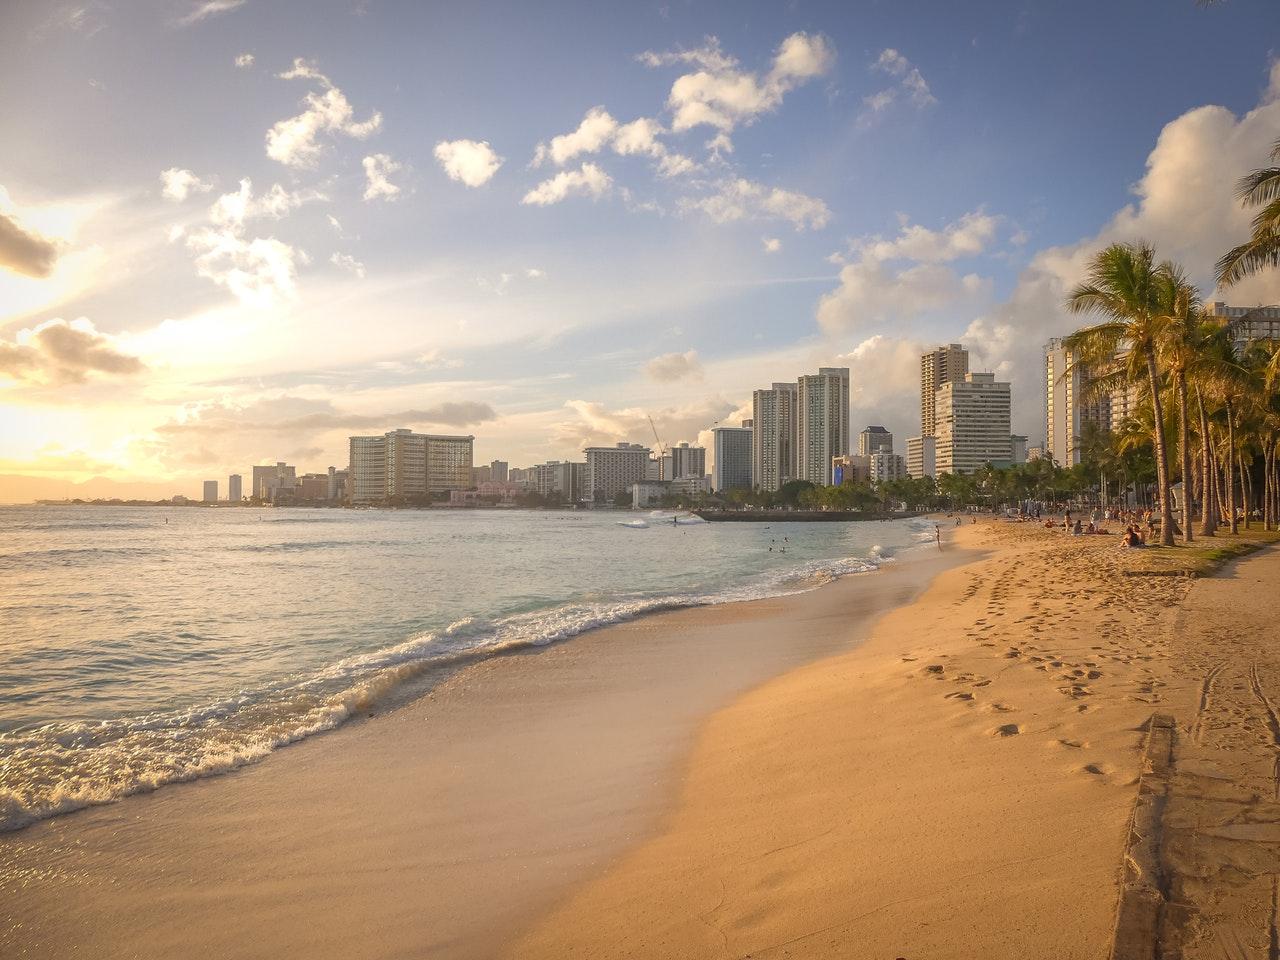 Best Classic Beach: Waikiki Beach, Oahu – 7 Days